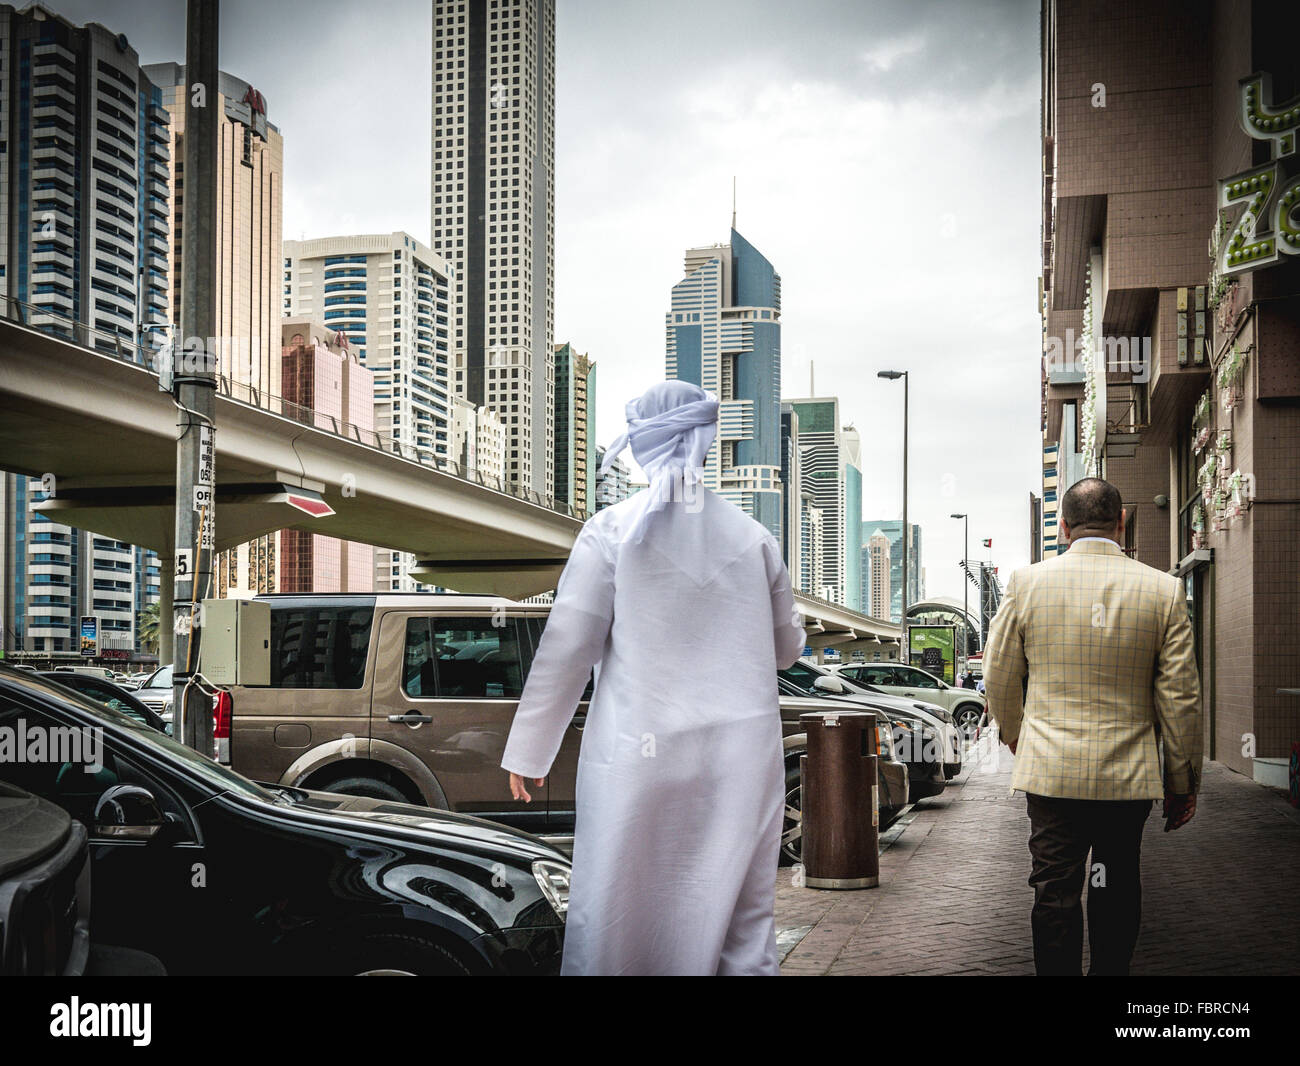 Arab man walking along busy Sheik Zayed Road - Stock Image